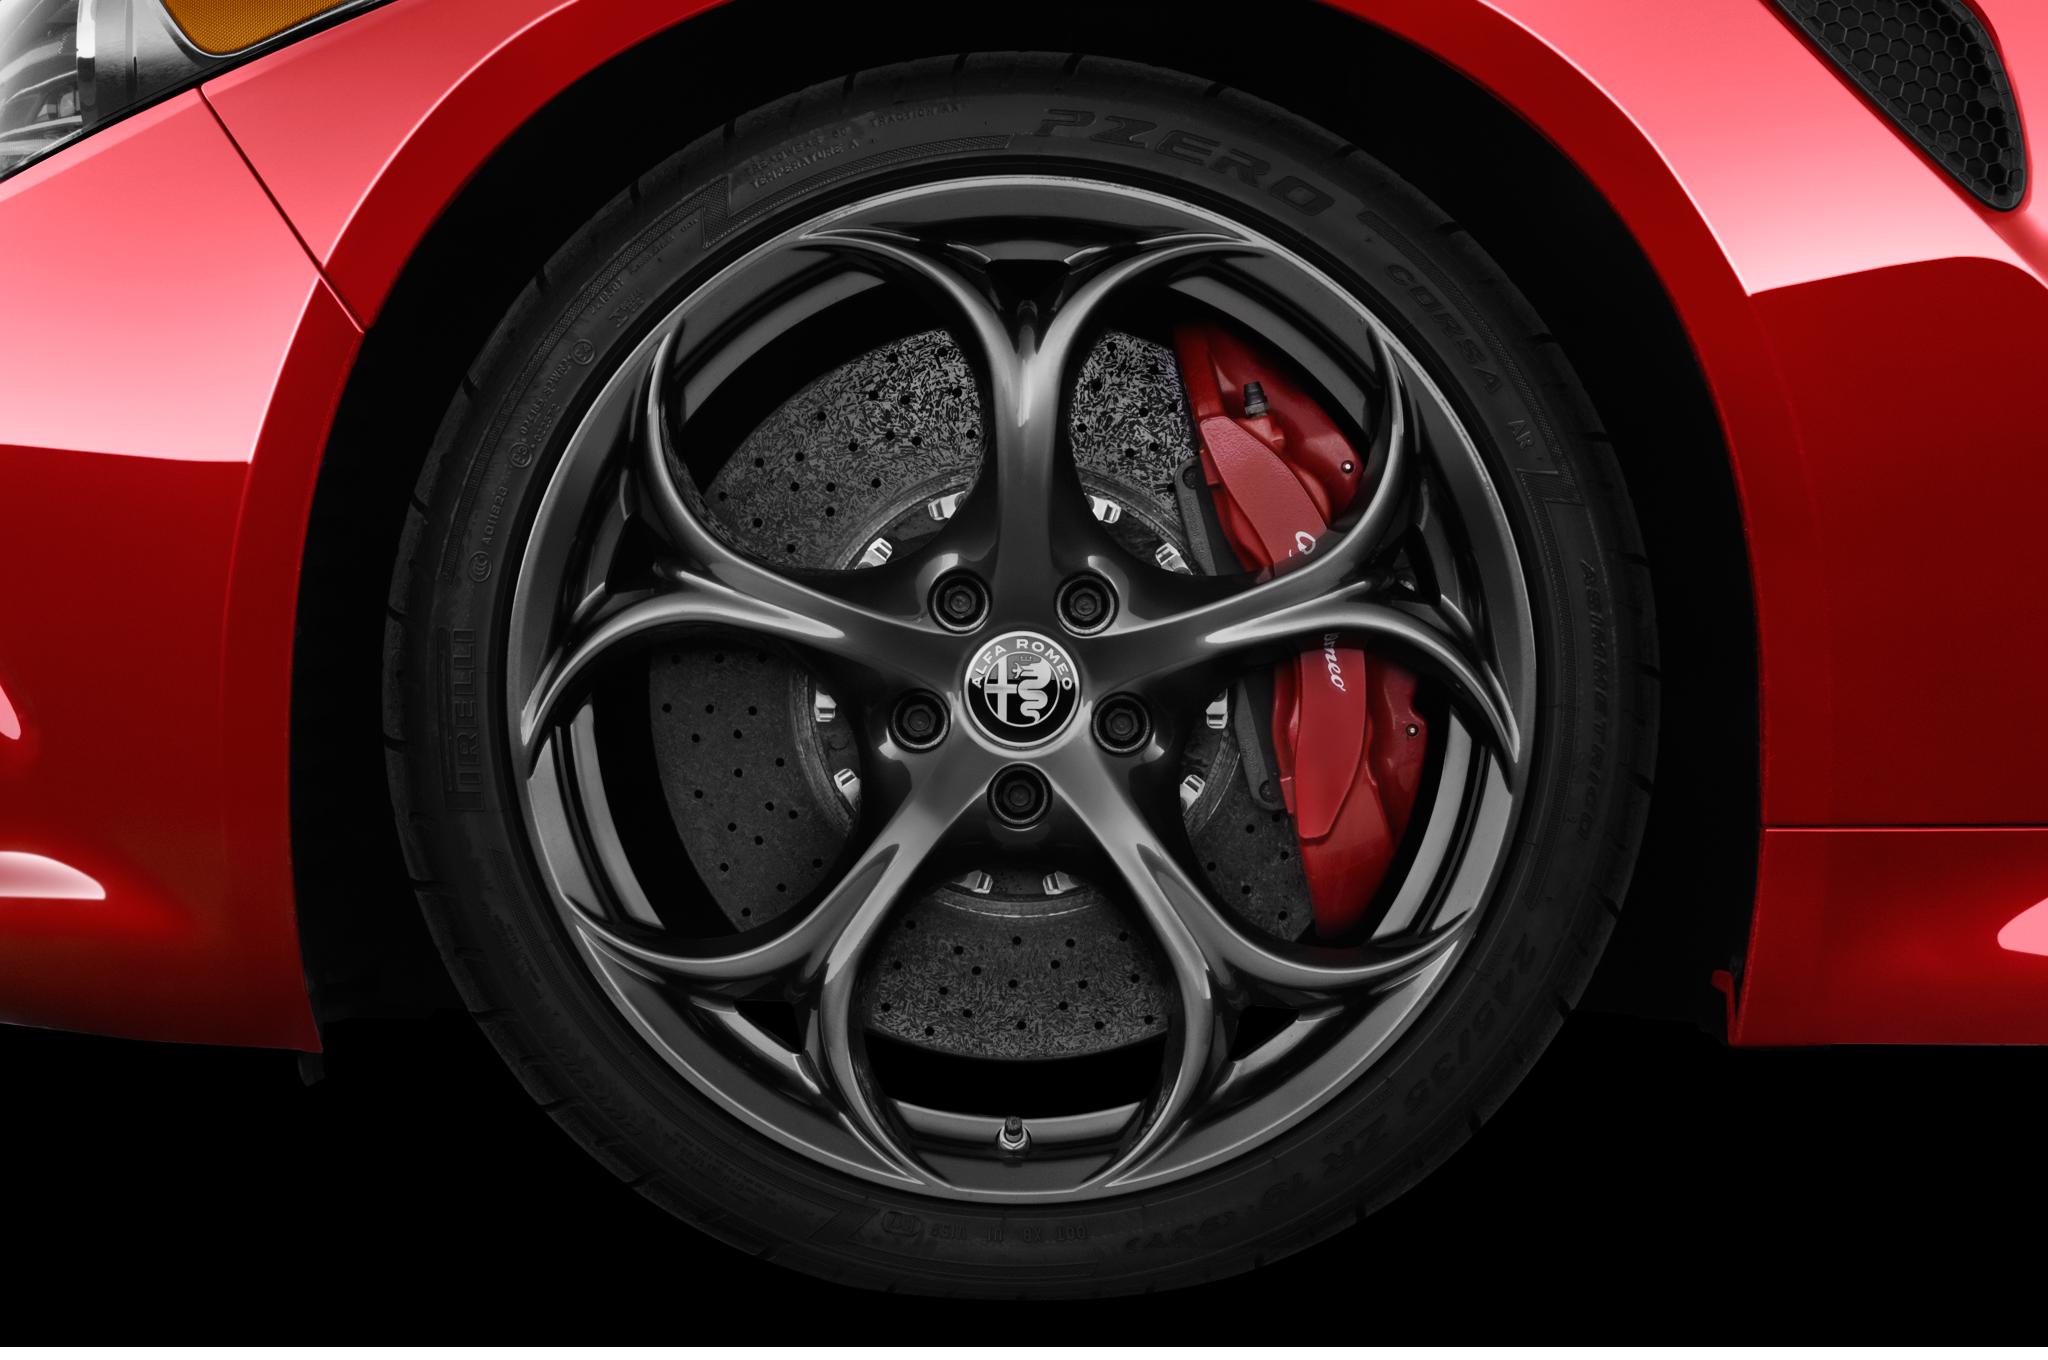 2017 Alfa Romeo Giulia Msrp >> WATCH: Alfa Romeo and the Mille Miglia | Automobile Magazine